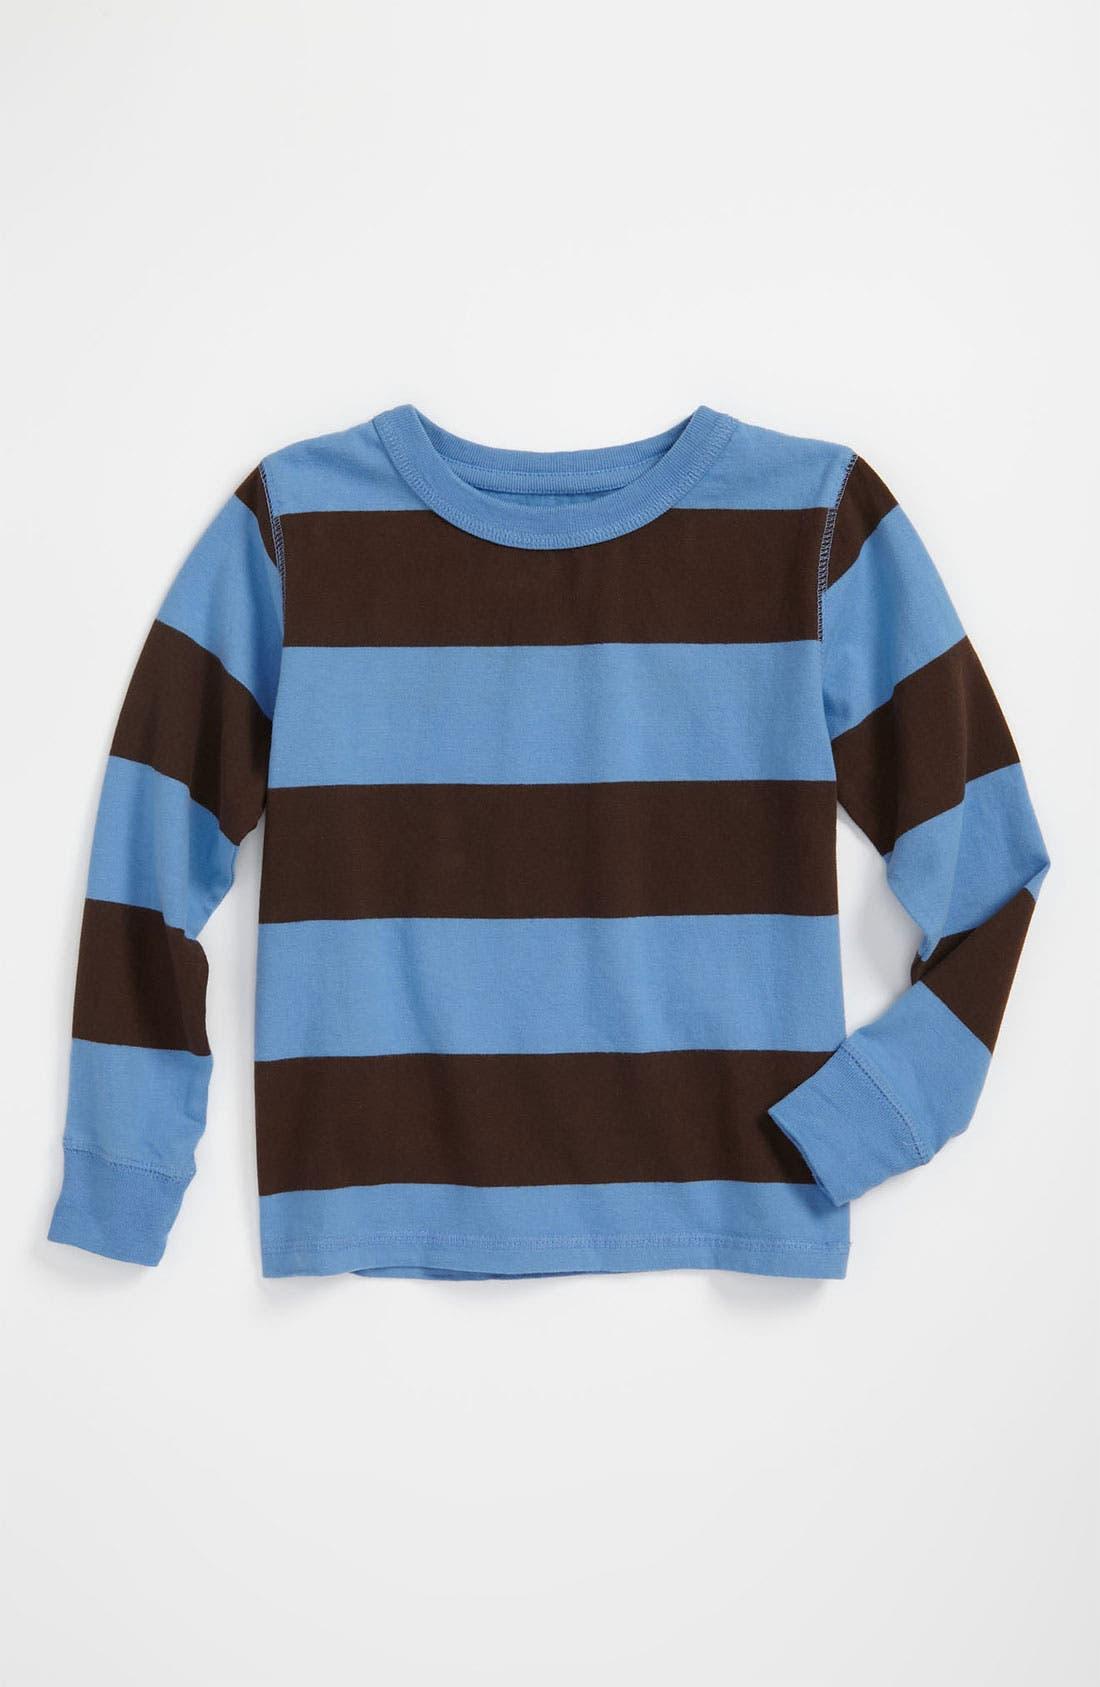 Main Image - Peek 'Corbett' Sueded Crewneck T-Shirt (Toddler, Little Boys & Big Boys)